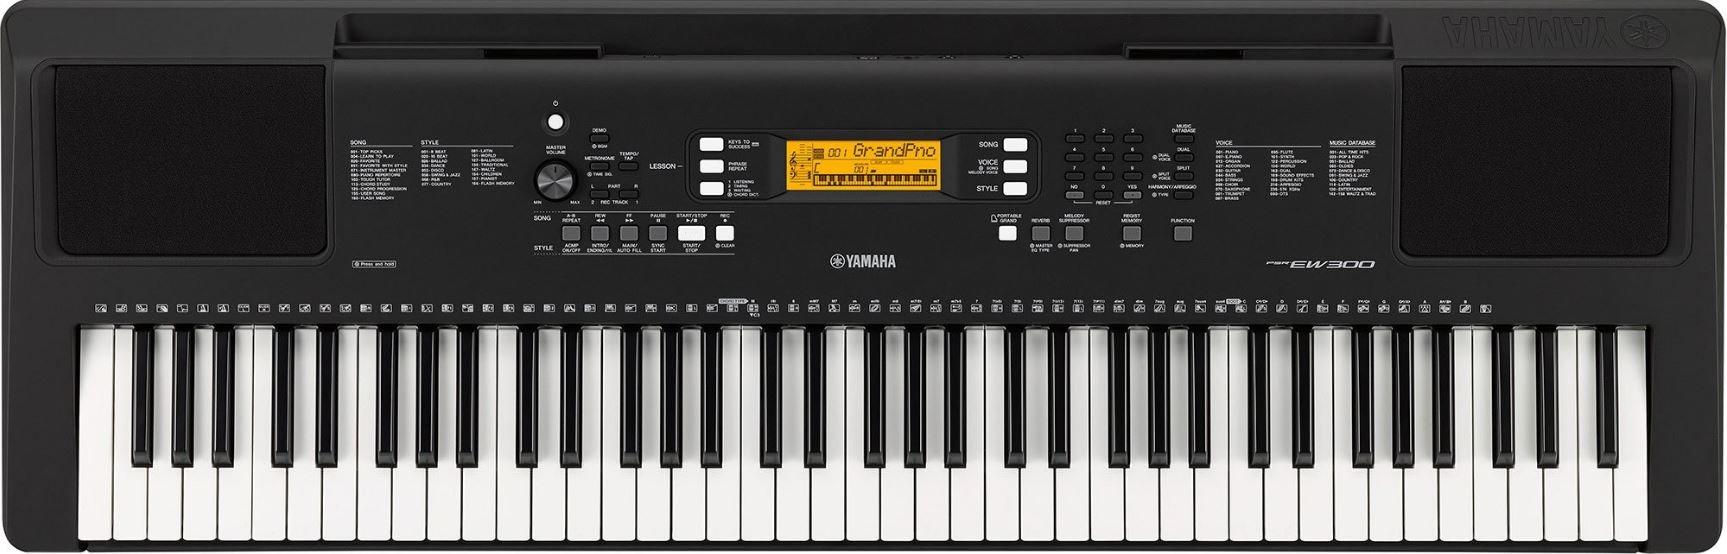 Yamaha PSREW300 76-Key Portable Keyboard